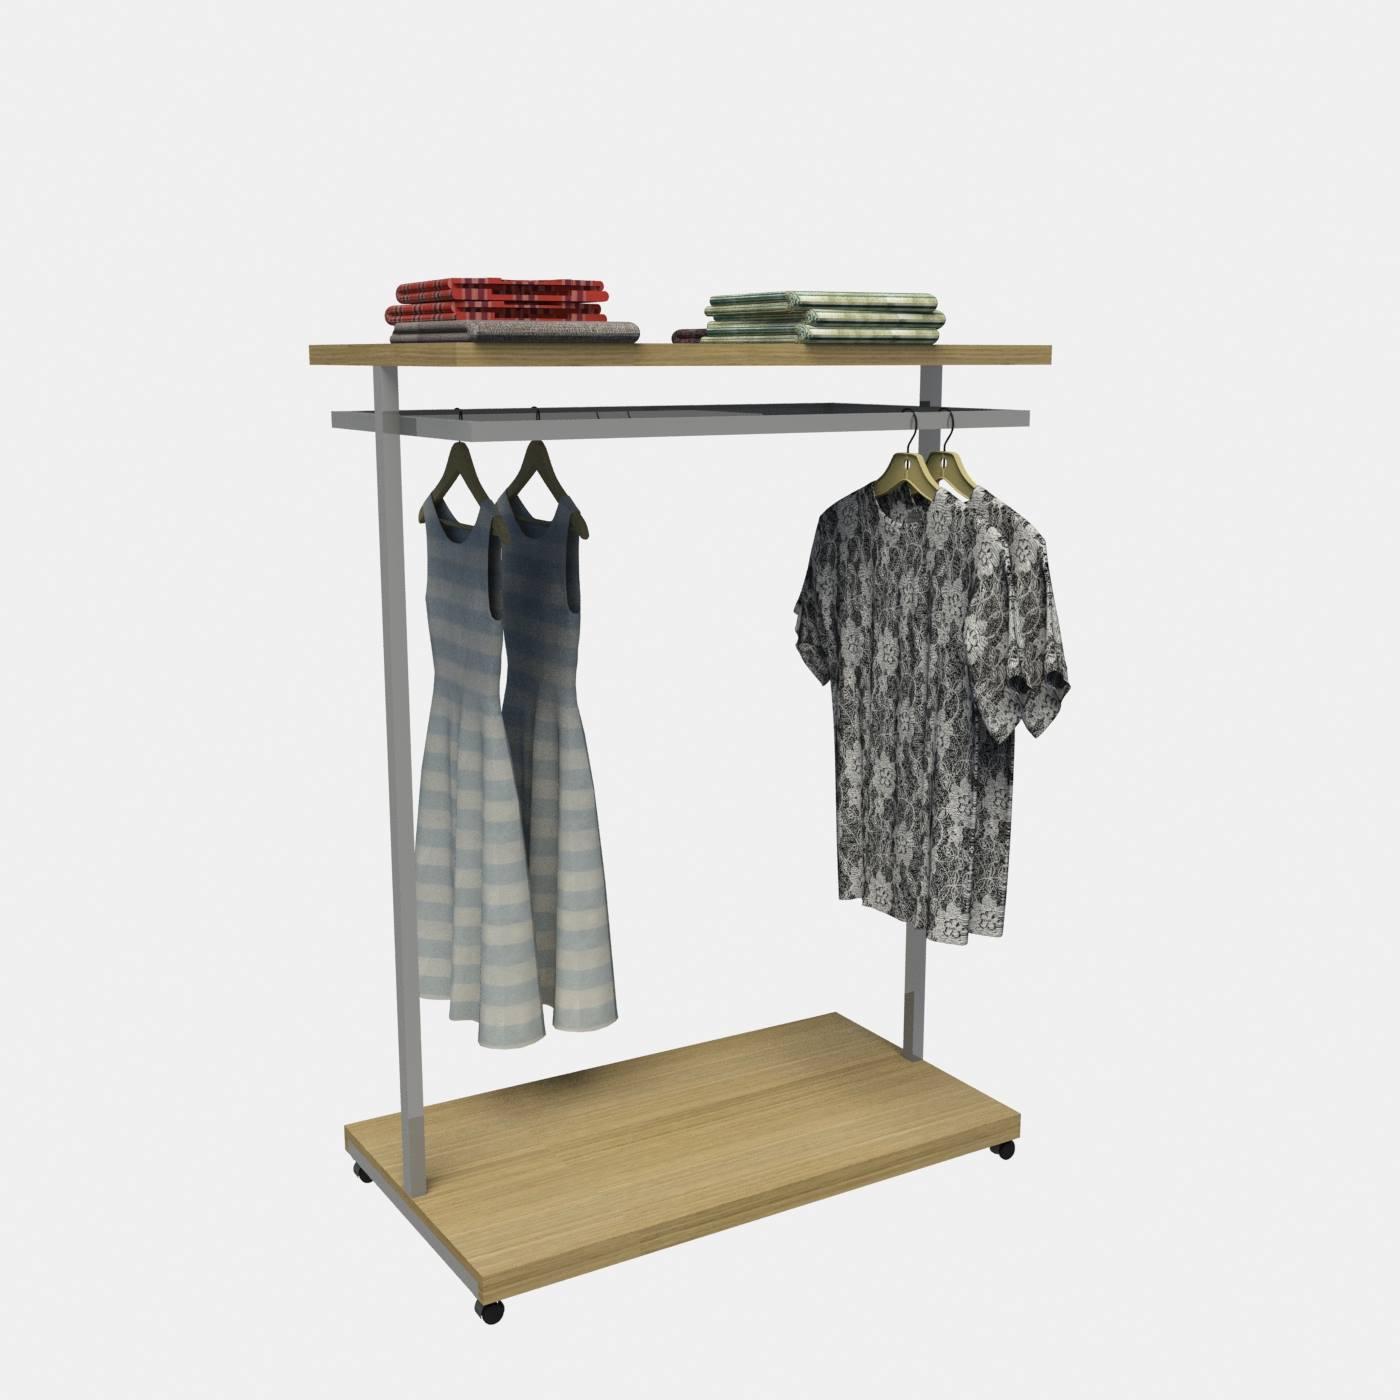 bdec7c5954c Σταντ ένδυσης εξοπλισμός καταστημάτων ρούχων ενδυμάτων μεταλλικά σταντ  καταστήματος